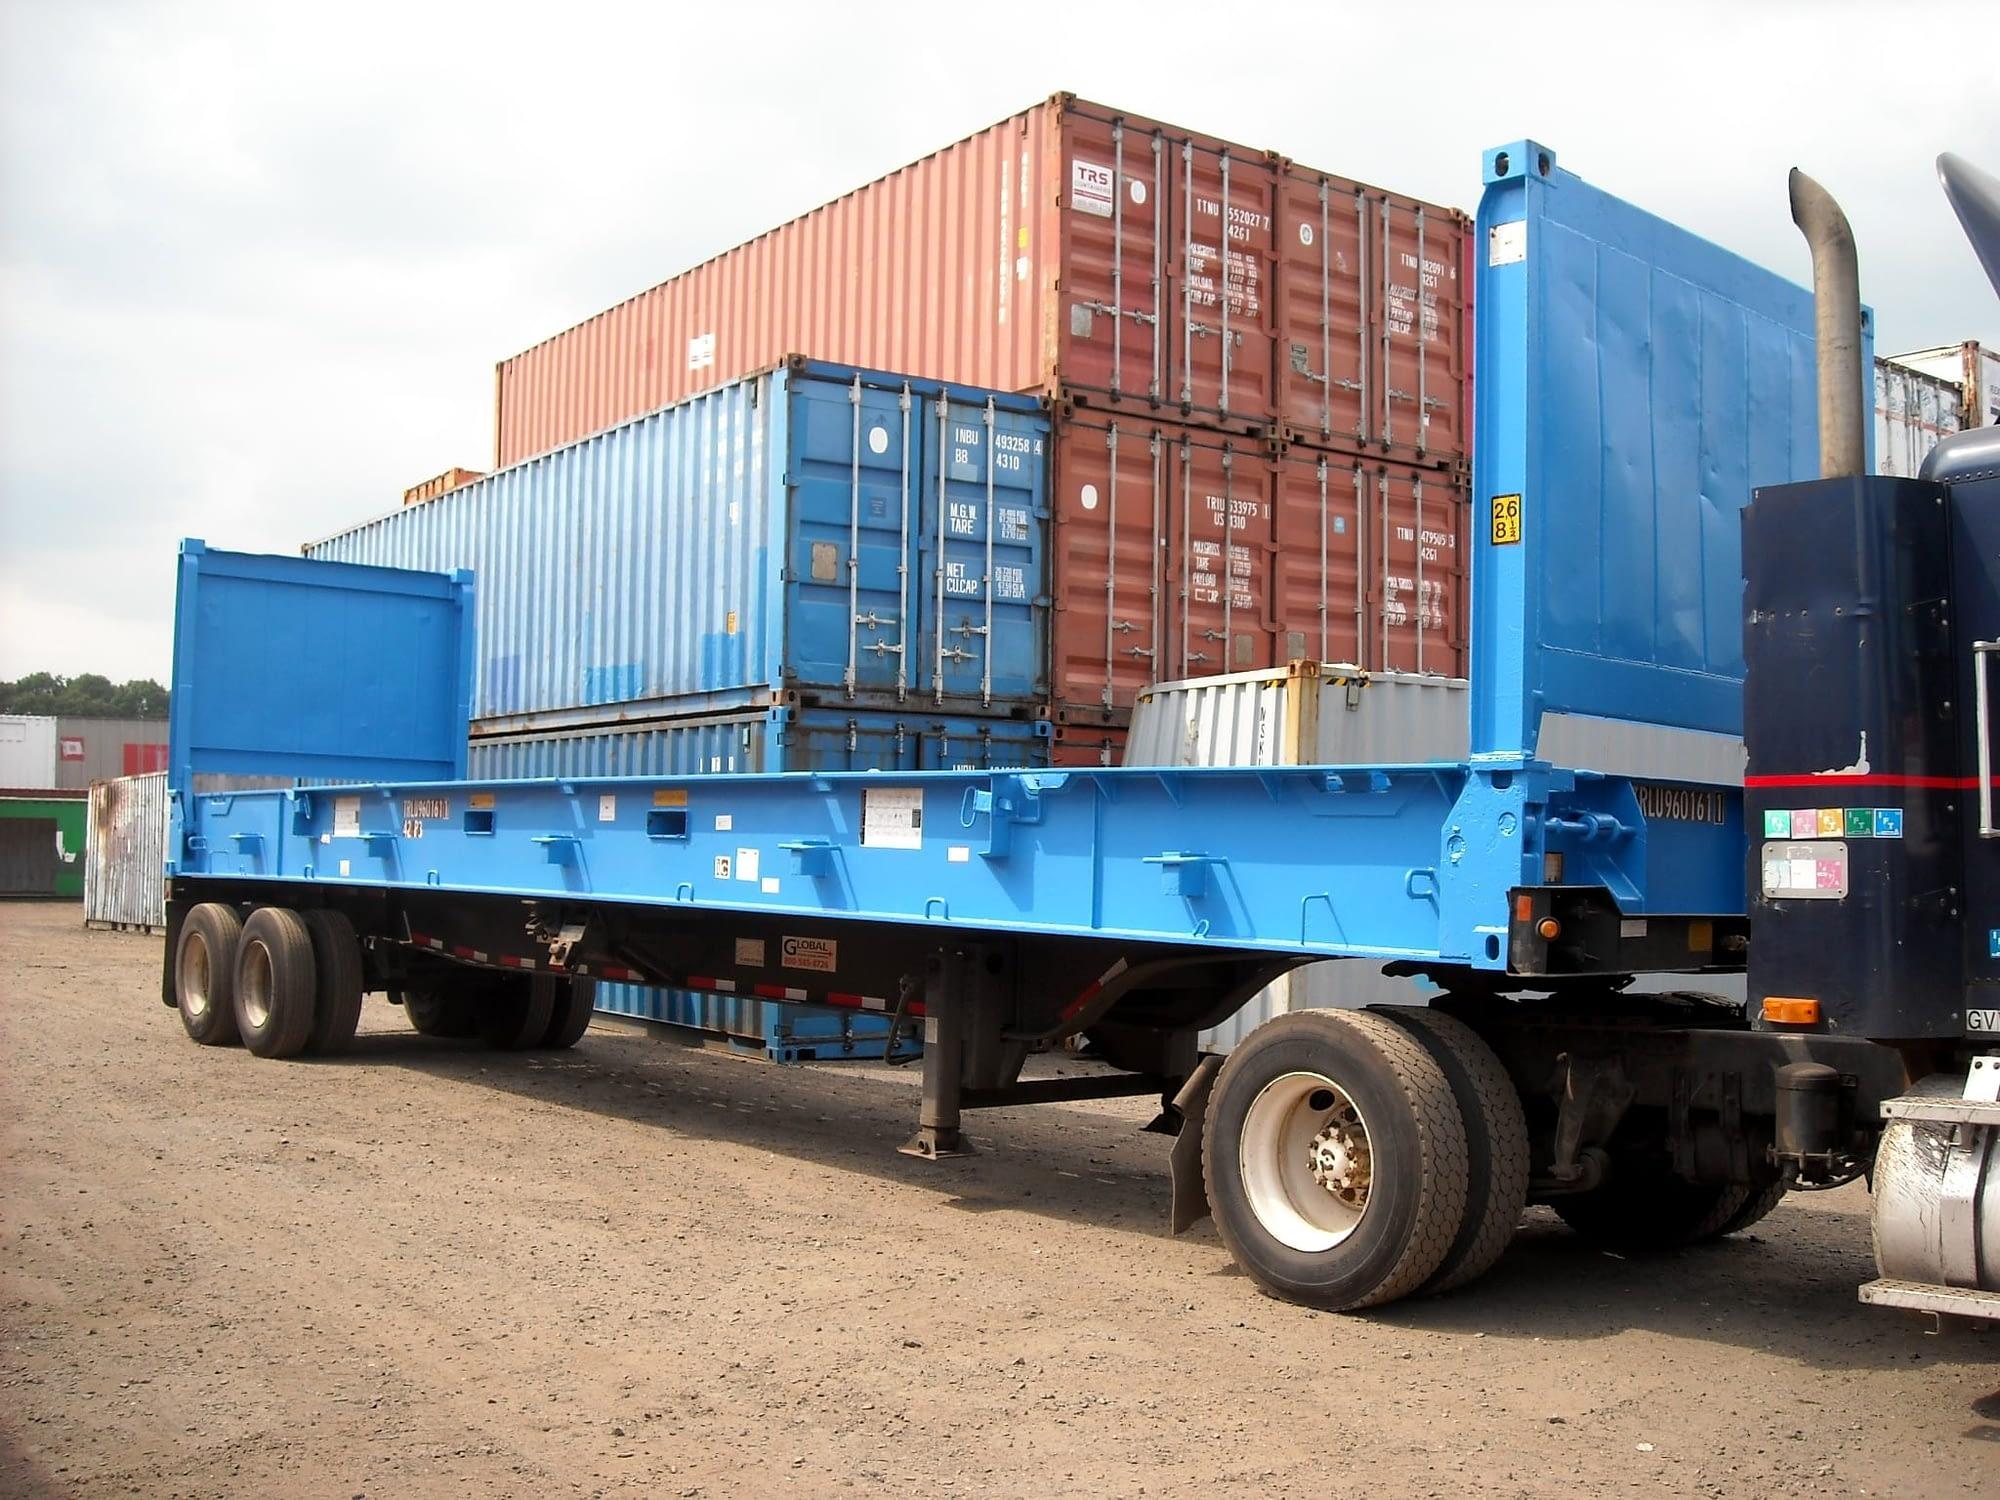 TRS 40ft flatracks carry heavy or odd shaped cargo